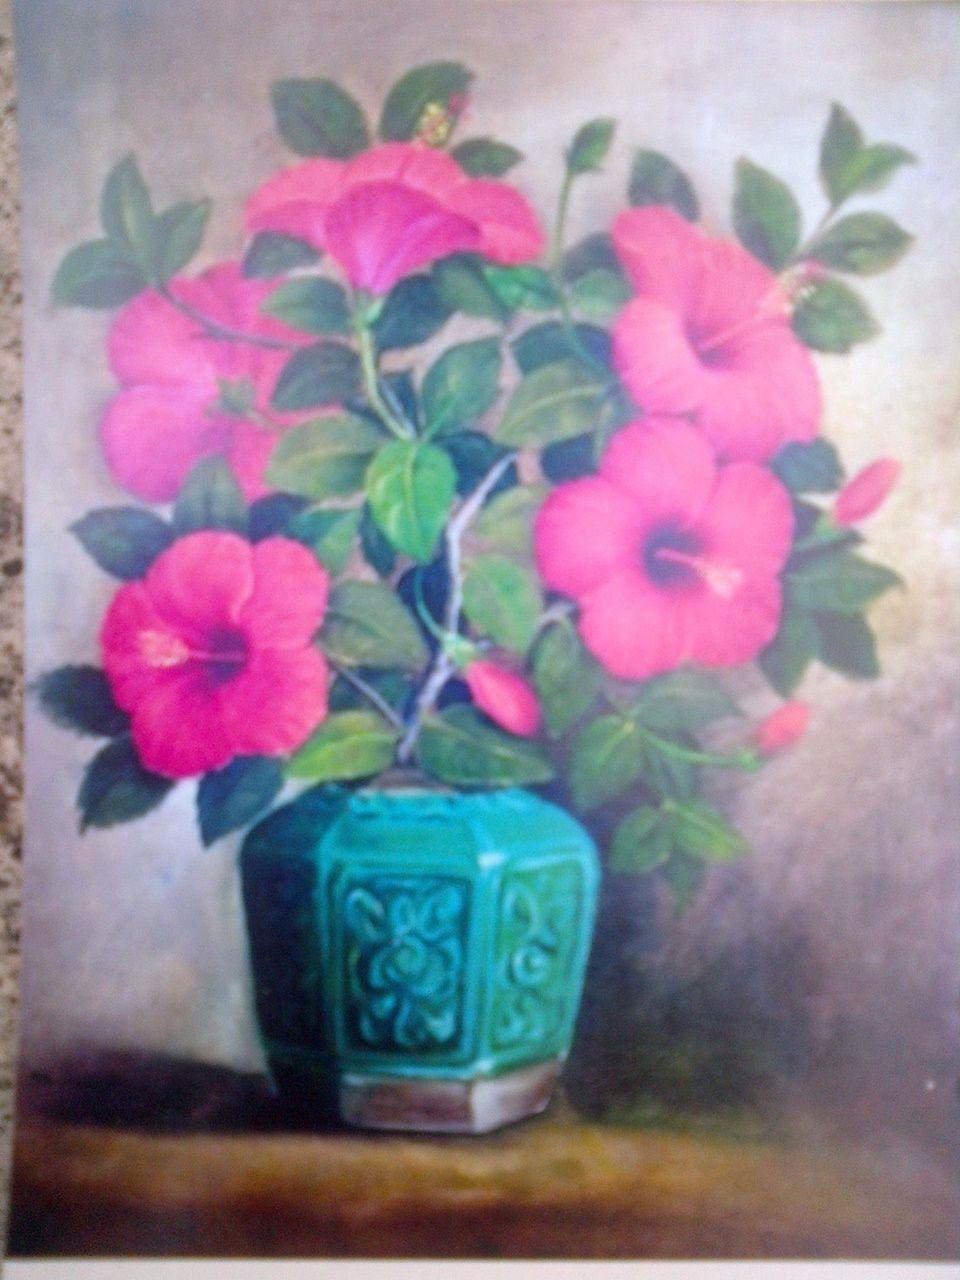 Jual Lukisan Bunga Oil On Canvas 30 70 Cm Harga Nego Lukisan Bunga Lukisan Bunga